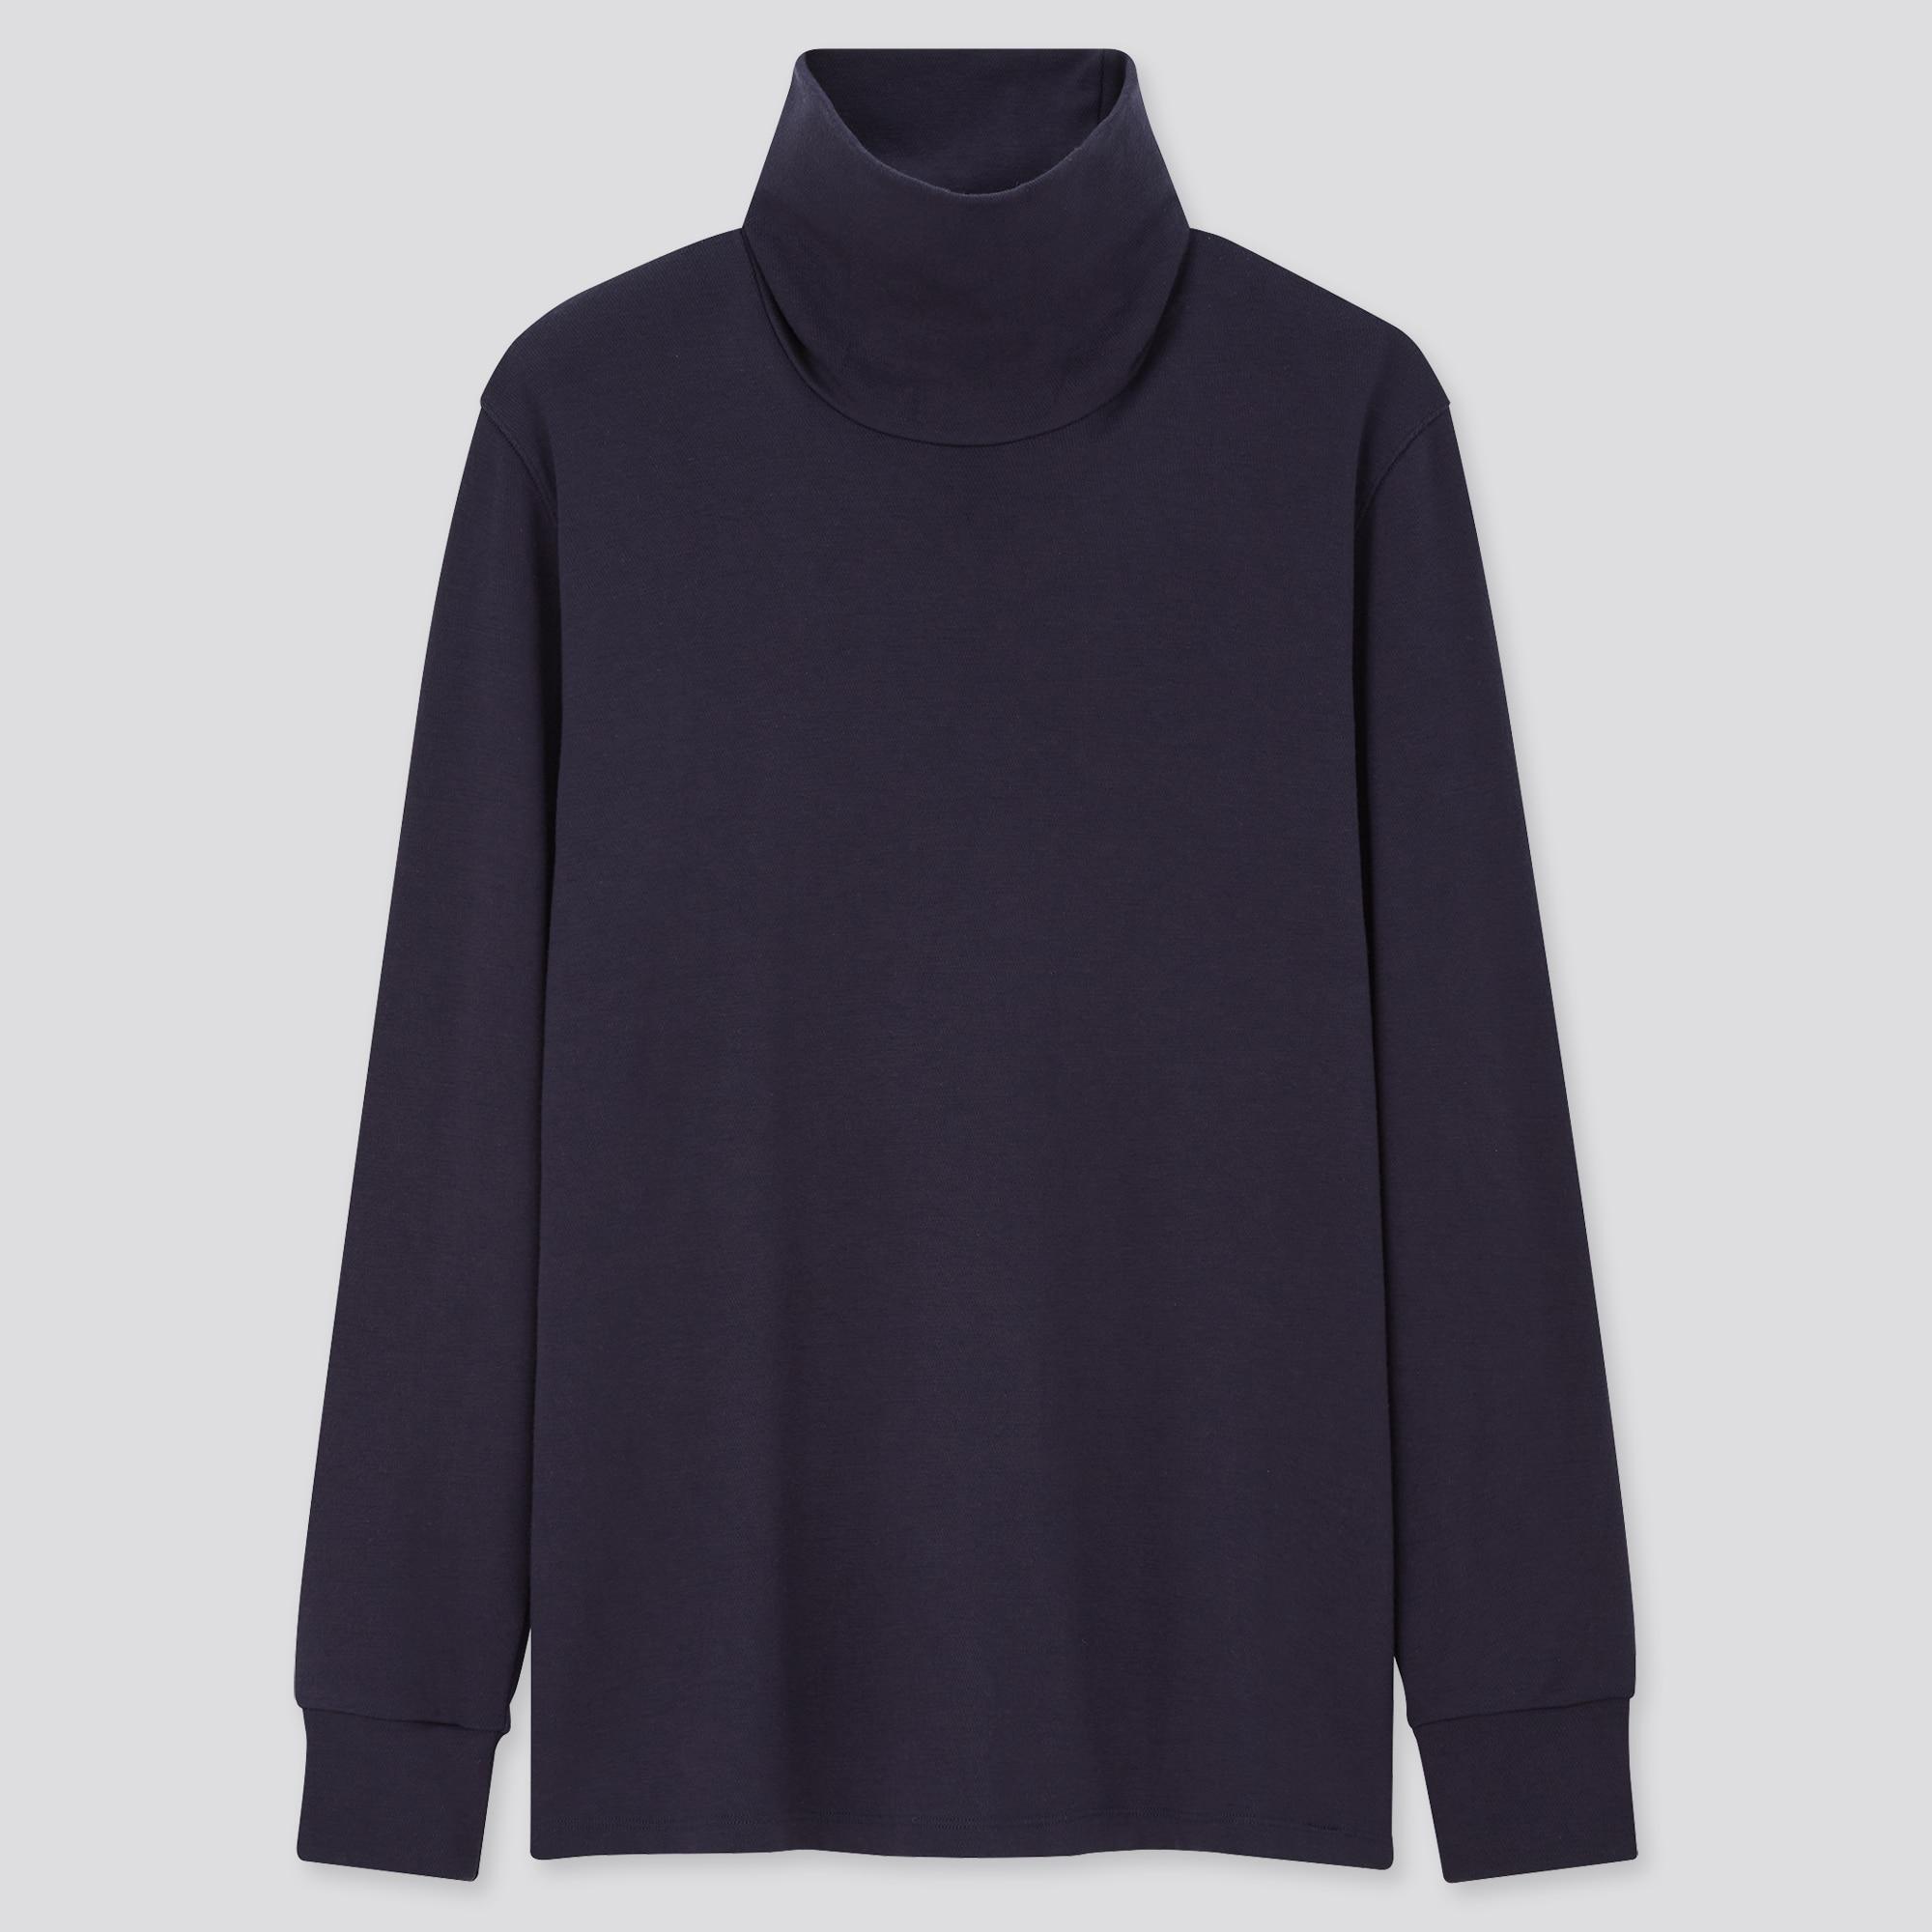 men HEATTECH ultra warm turtleneck long-sleeve t-shirt